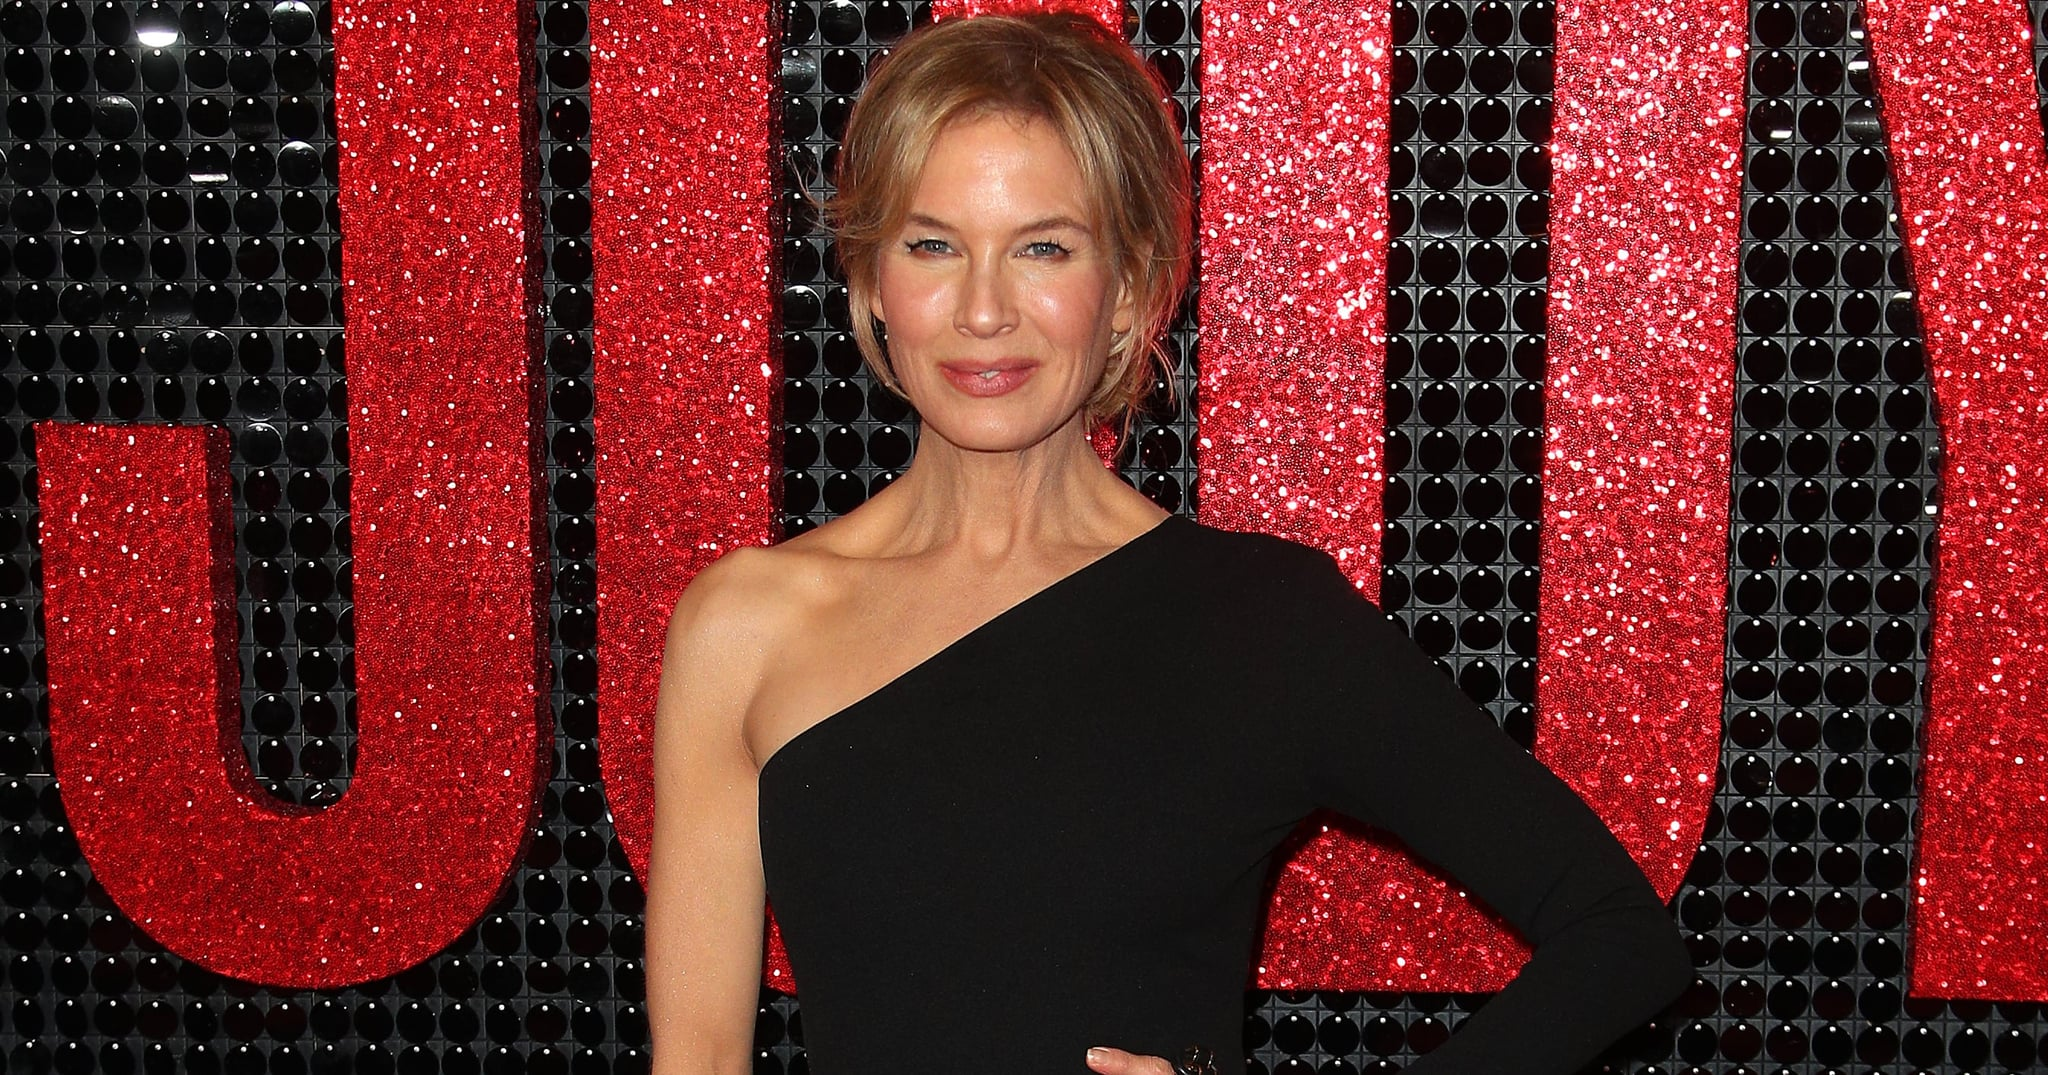 Renée Zellweger Will Receive an Award at the Santa Barbara International Film Festival